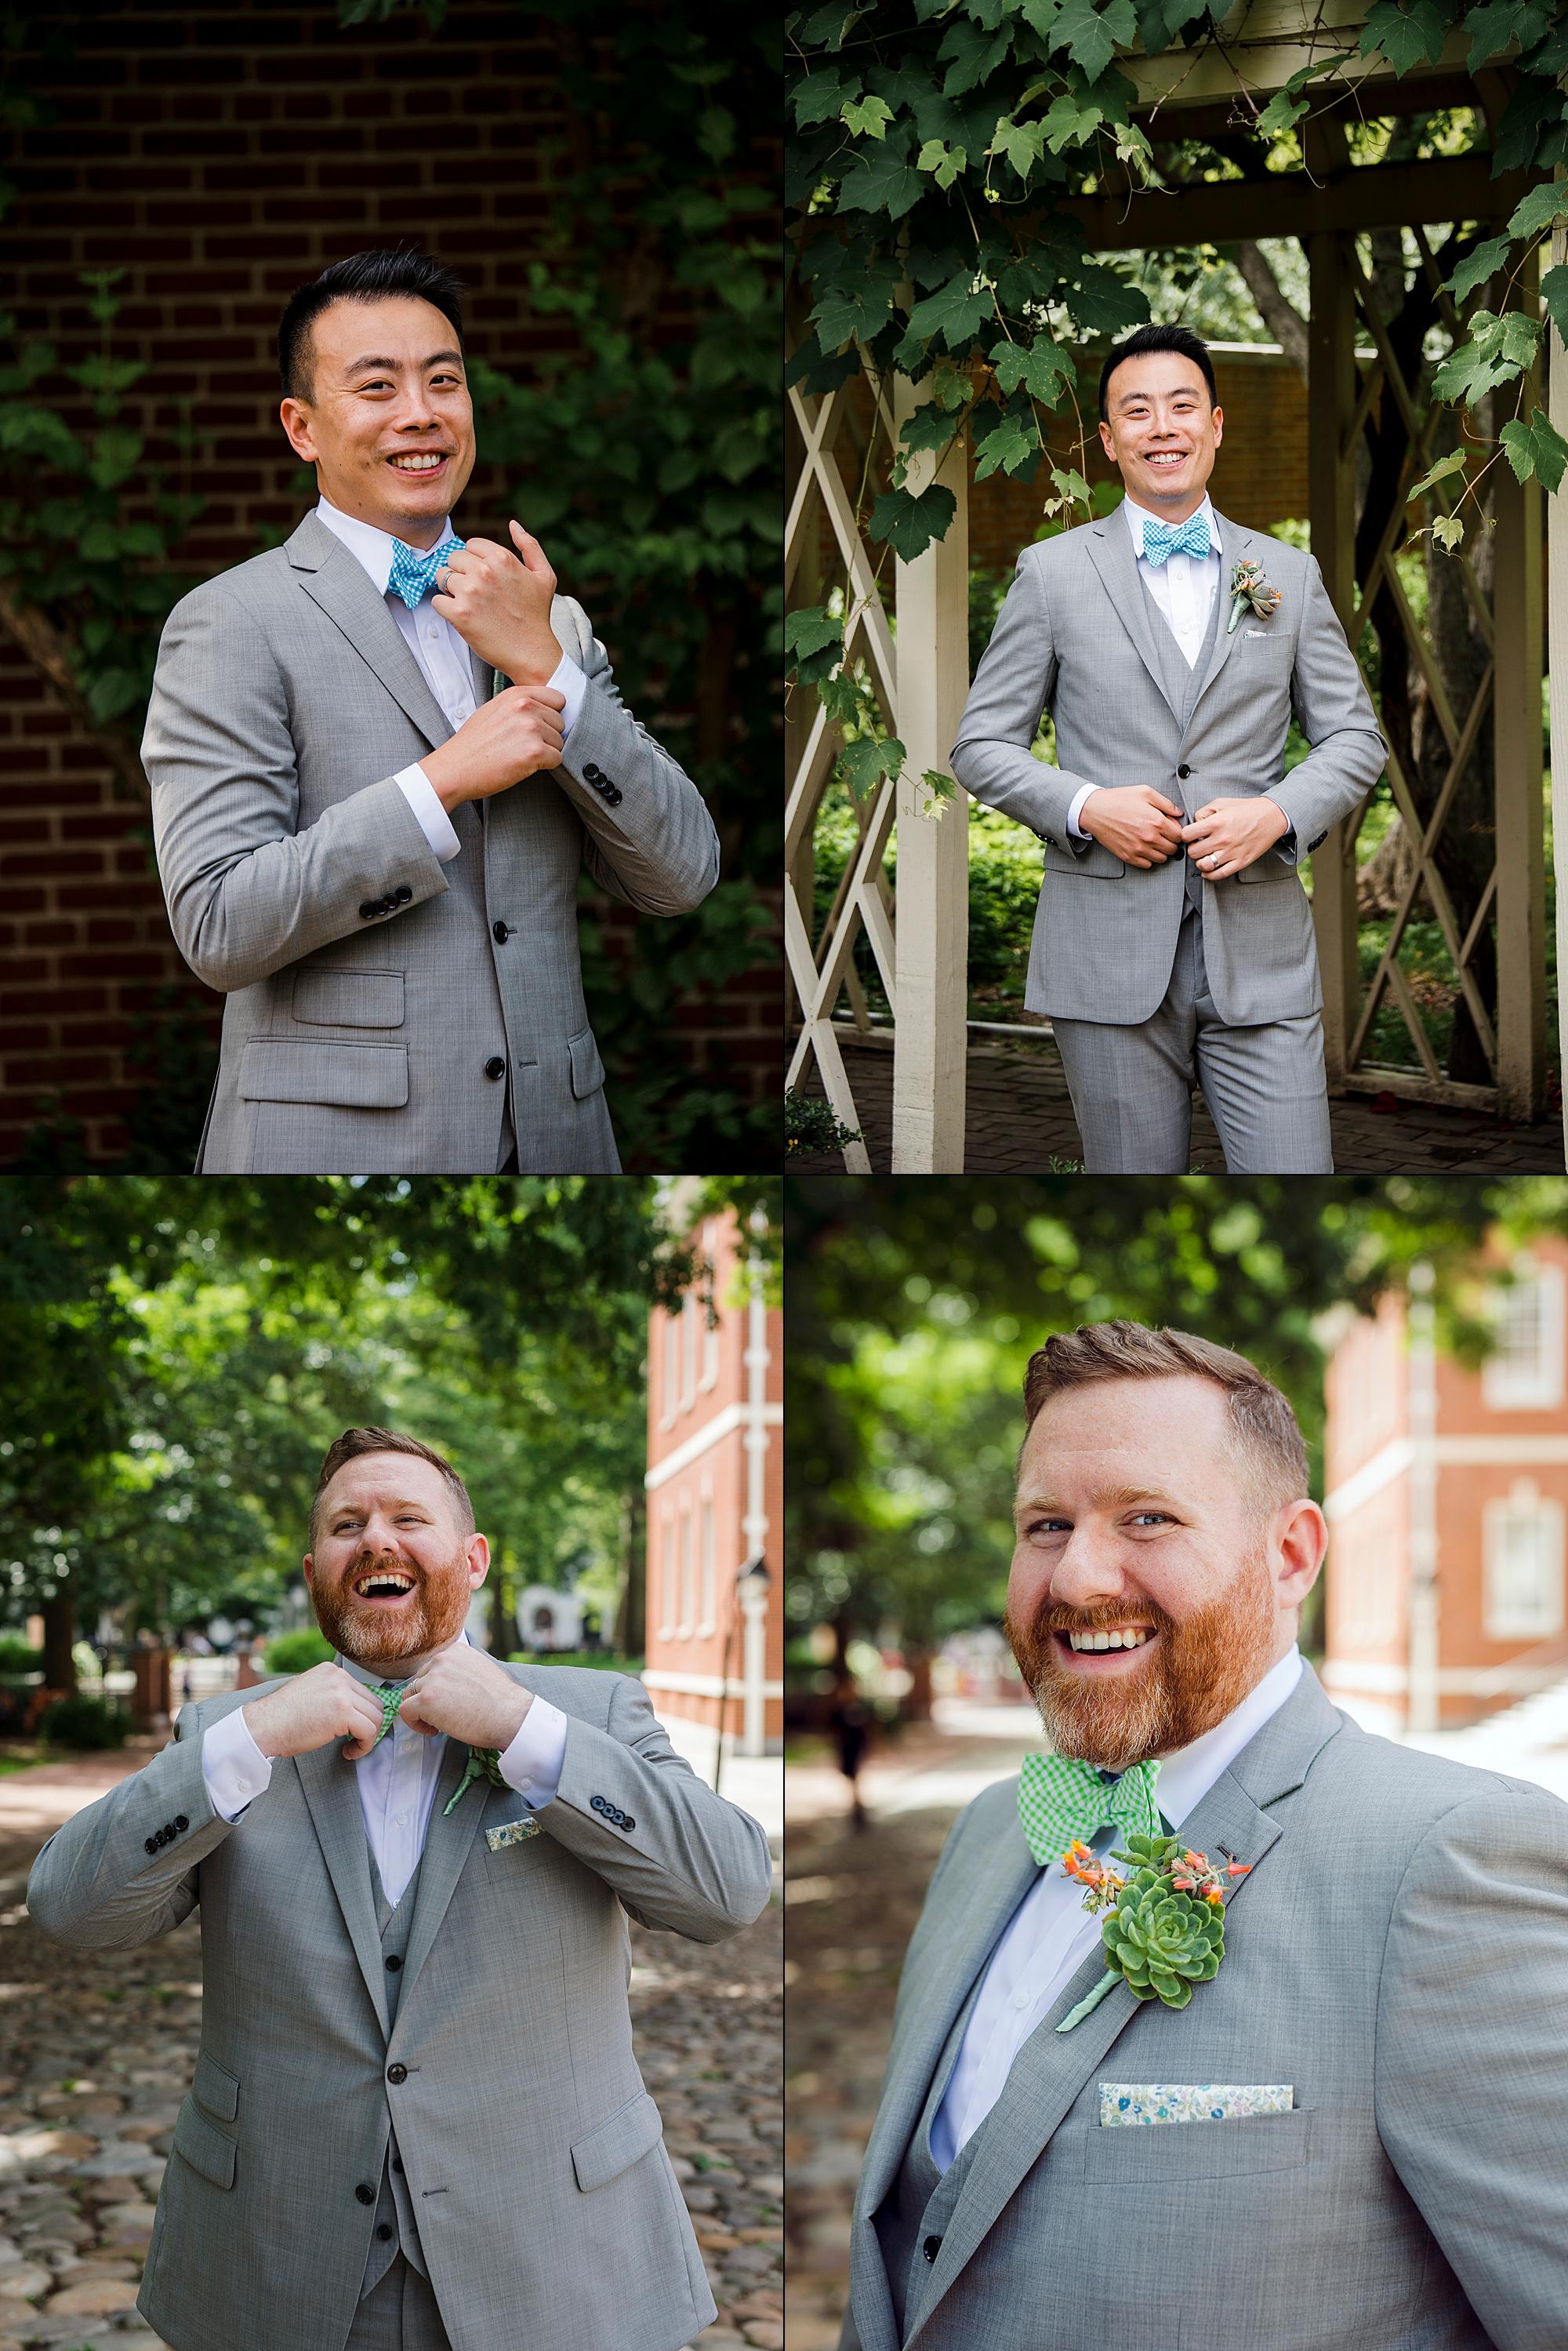 Dan_and_Byron_Love_by_Joe_Mac_Philadelphia_Wedding_LGBTQ_Photography_Gay_Independence_visitor_Center_27.JPG